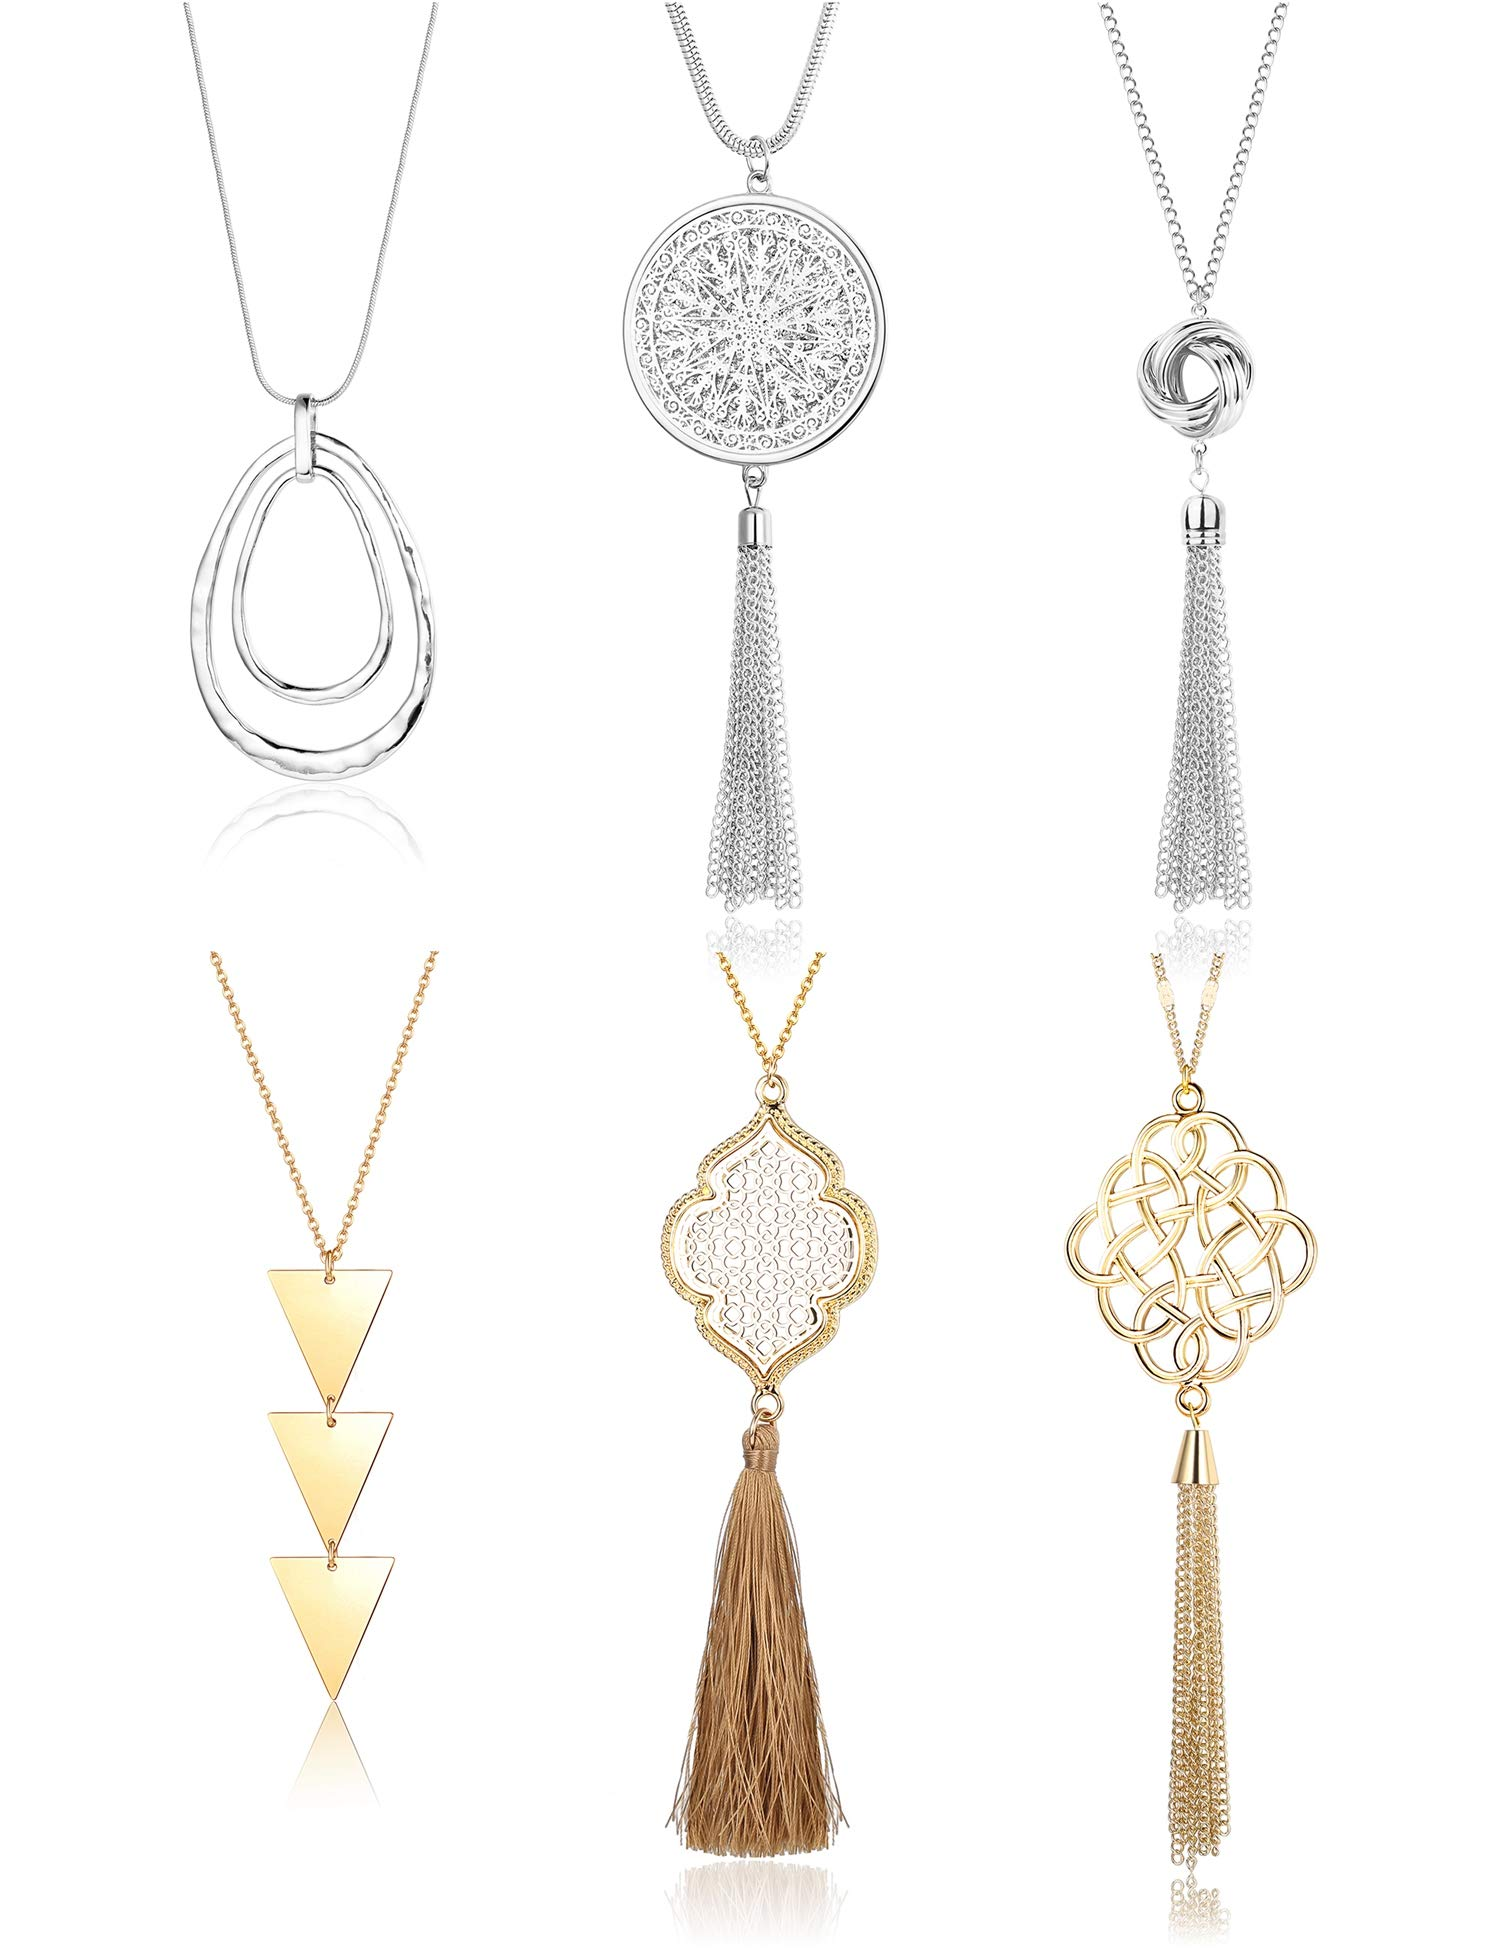 Finrezio 6PCS Long Pendant Necklace for Women Simple Three Triangle Arrow Circle Knot Tassel Y Strands Statement Necklaces Set by Finrezio